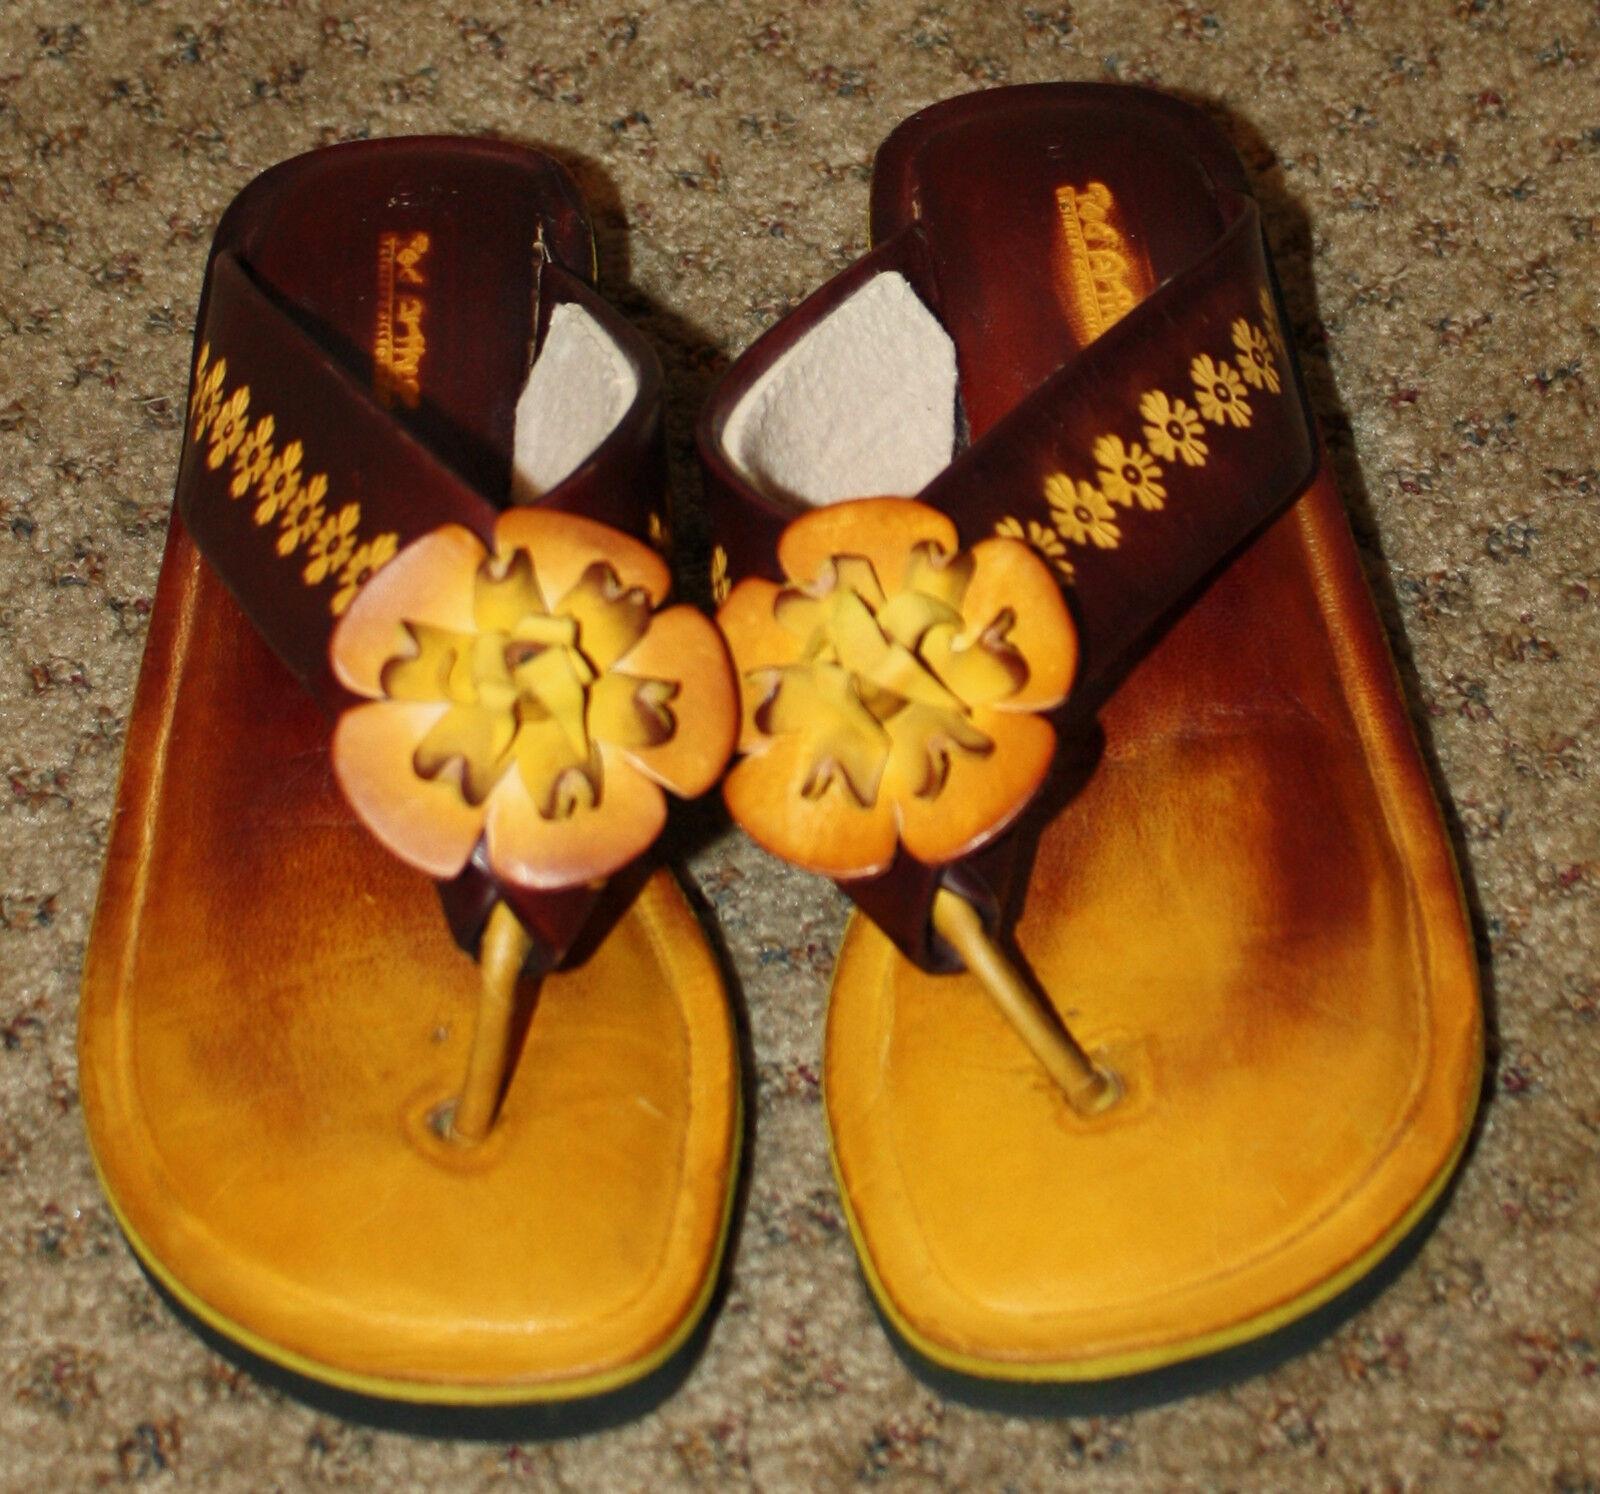 TED ARTHUR Burgundy gold Leather Sandals Tooled Flower NWOB 6